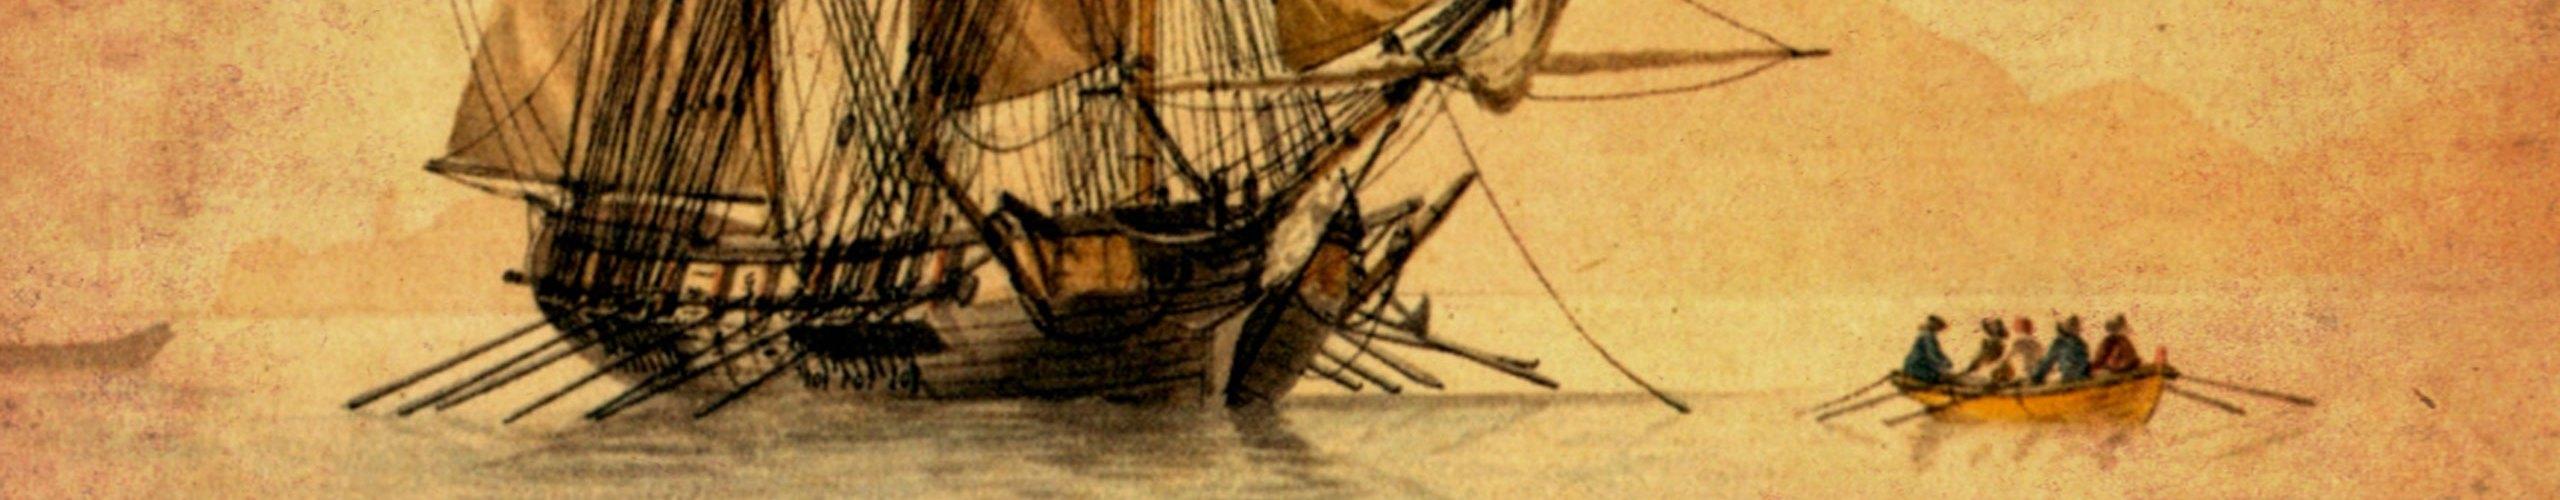 Rowing to Treasure Island